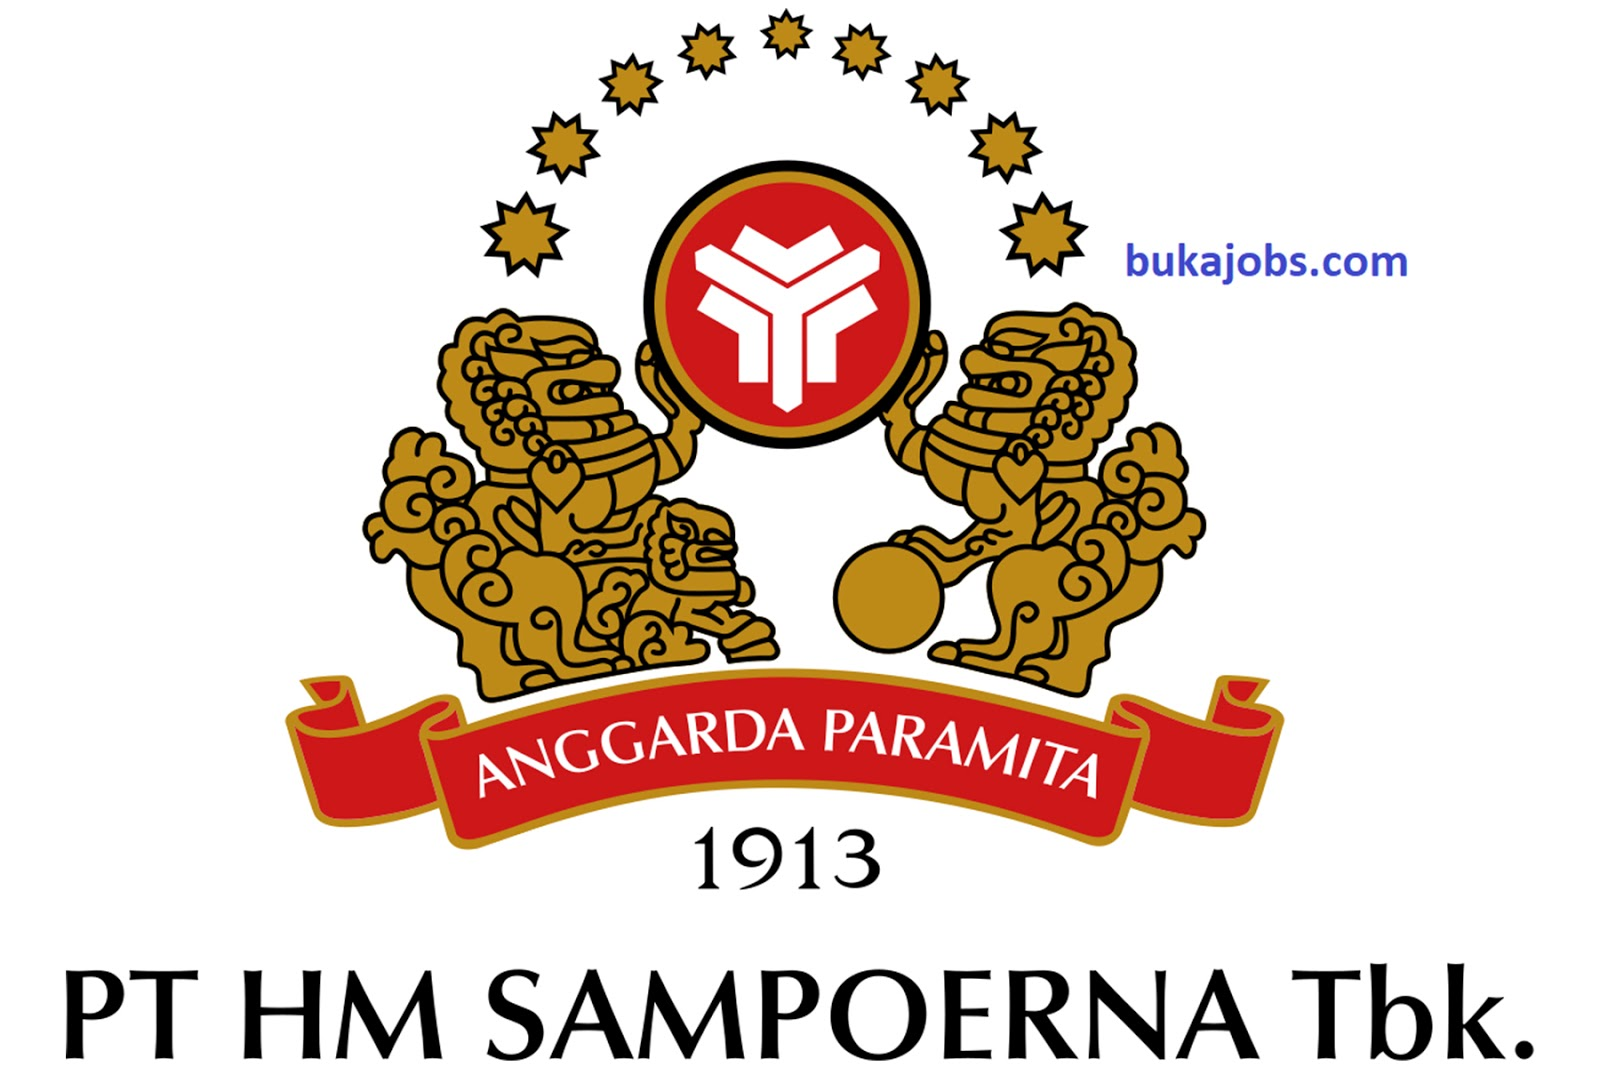 Lowongan Kerja PT. Hanjaya Mandala Sampoerna, Tbk. (Magang) 2019